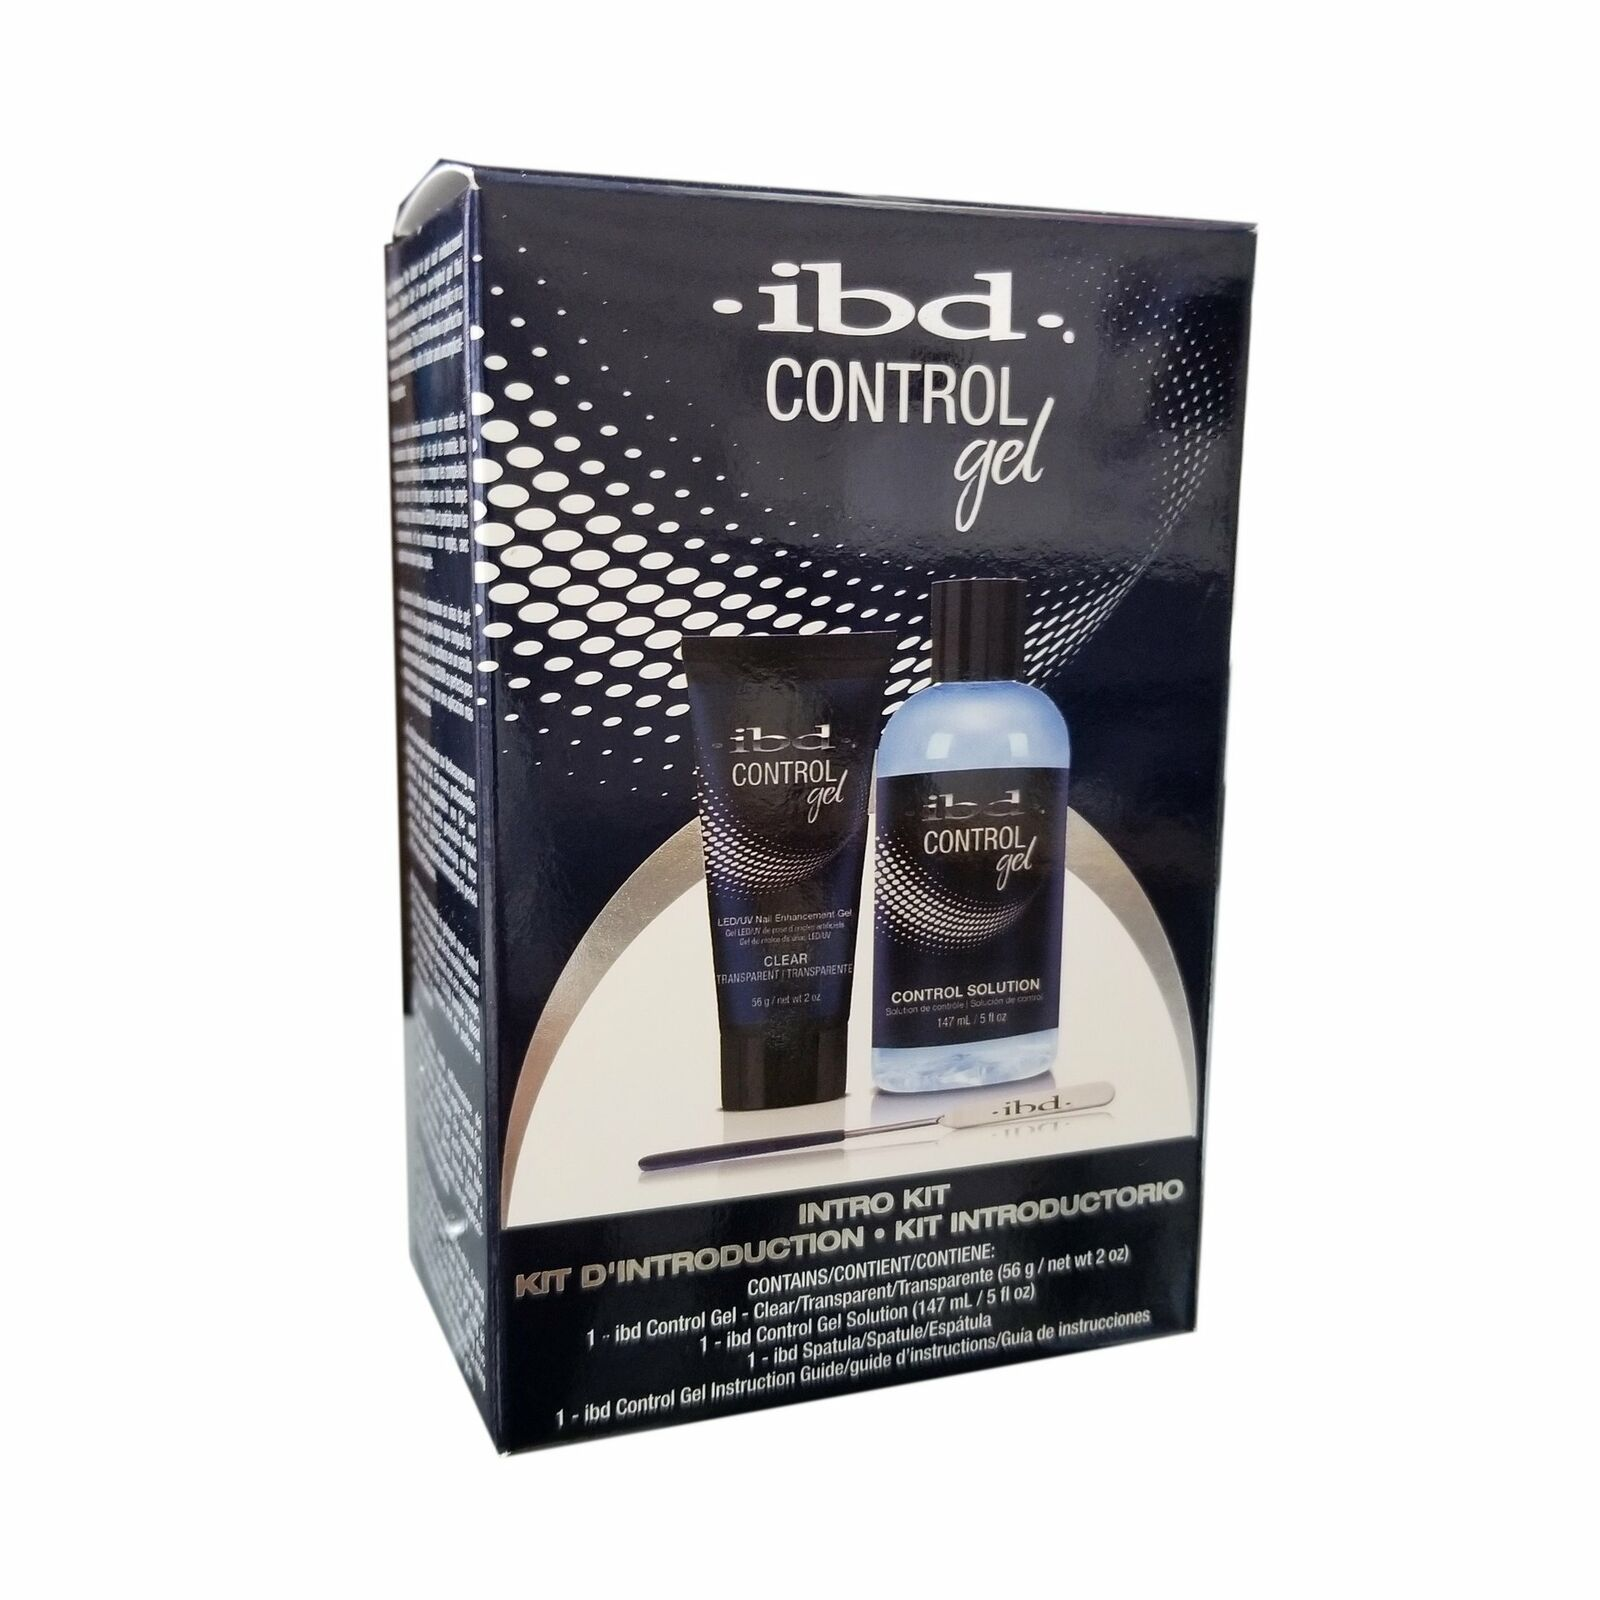 IBD Control Gel - Intro Kit #67628 - New Pro-Hybrid Gel